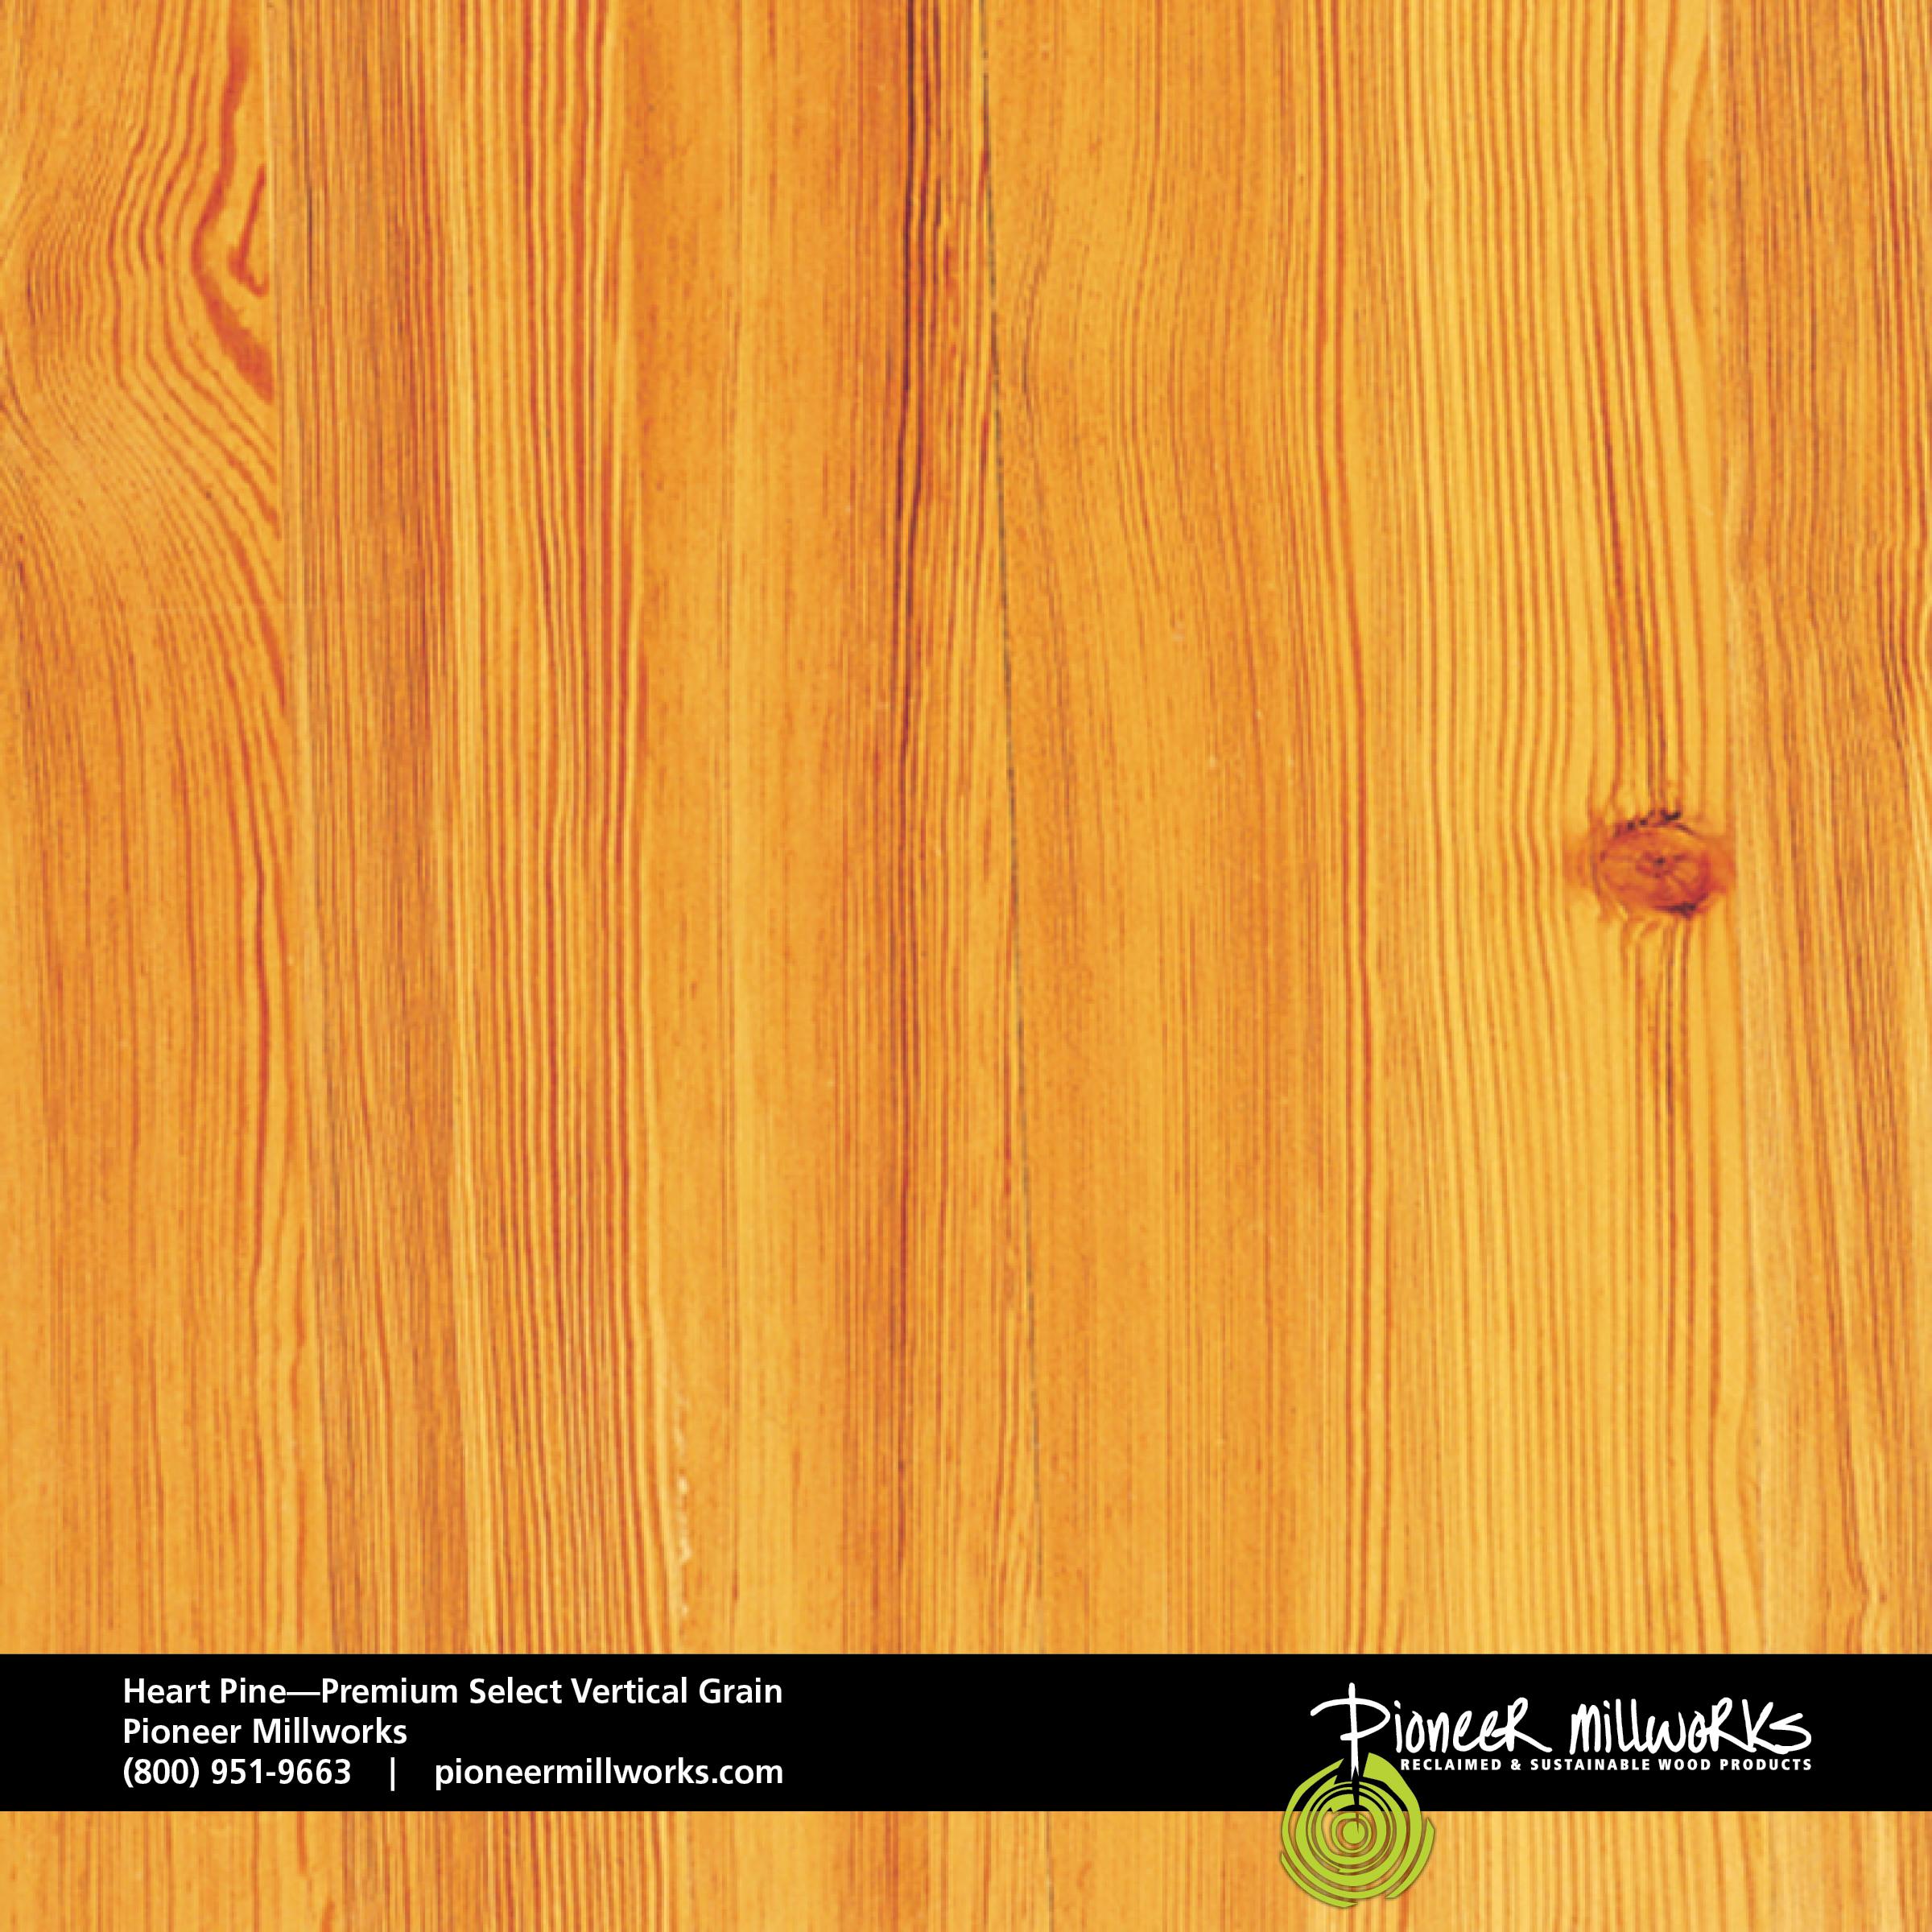 Heart Pine Premium Select Vertical Grain Pioneermillworks